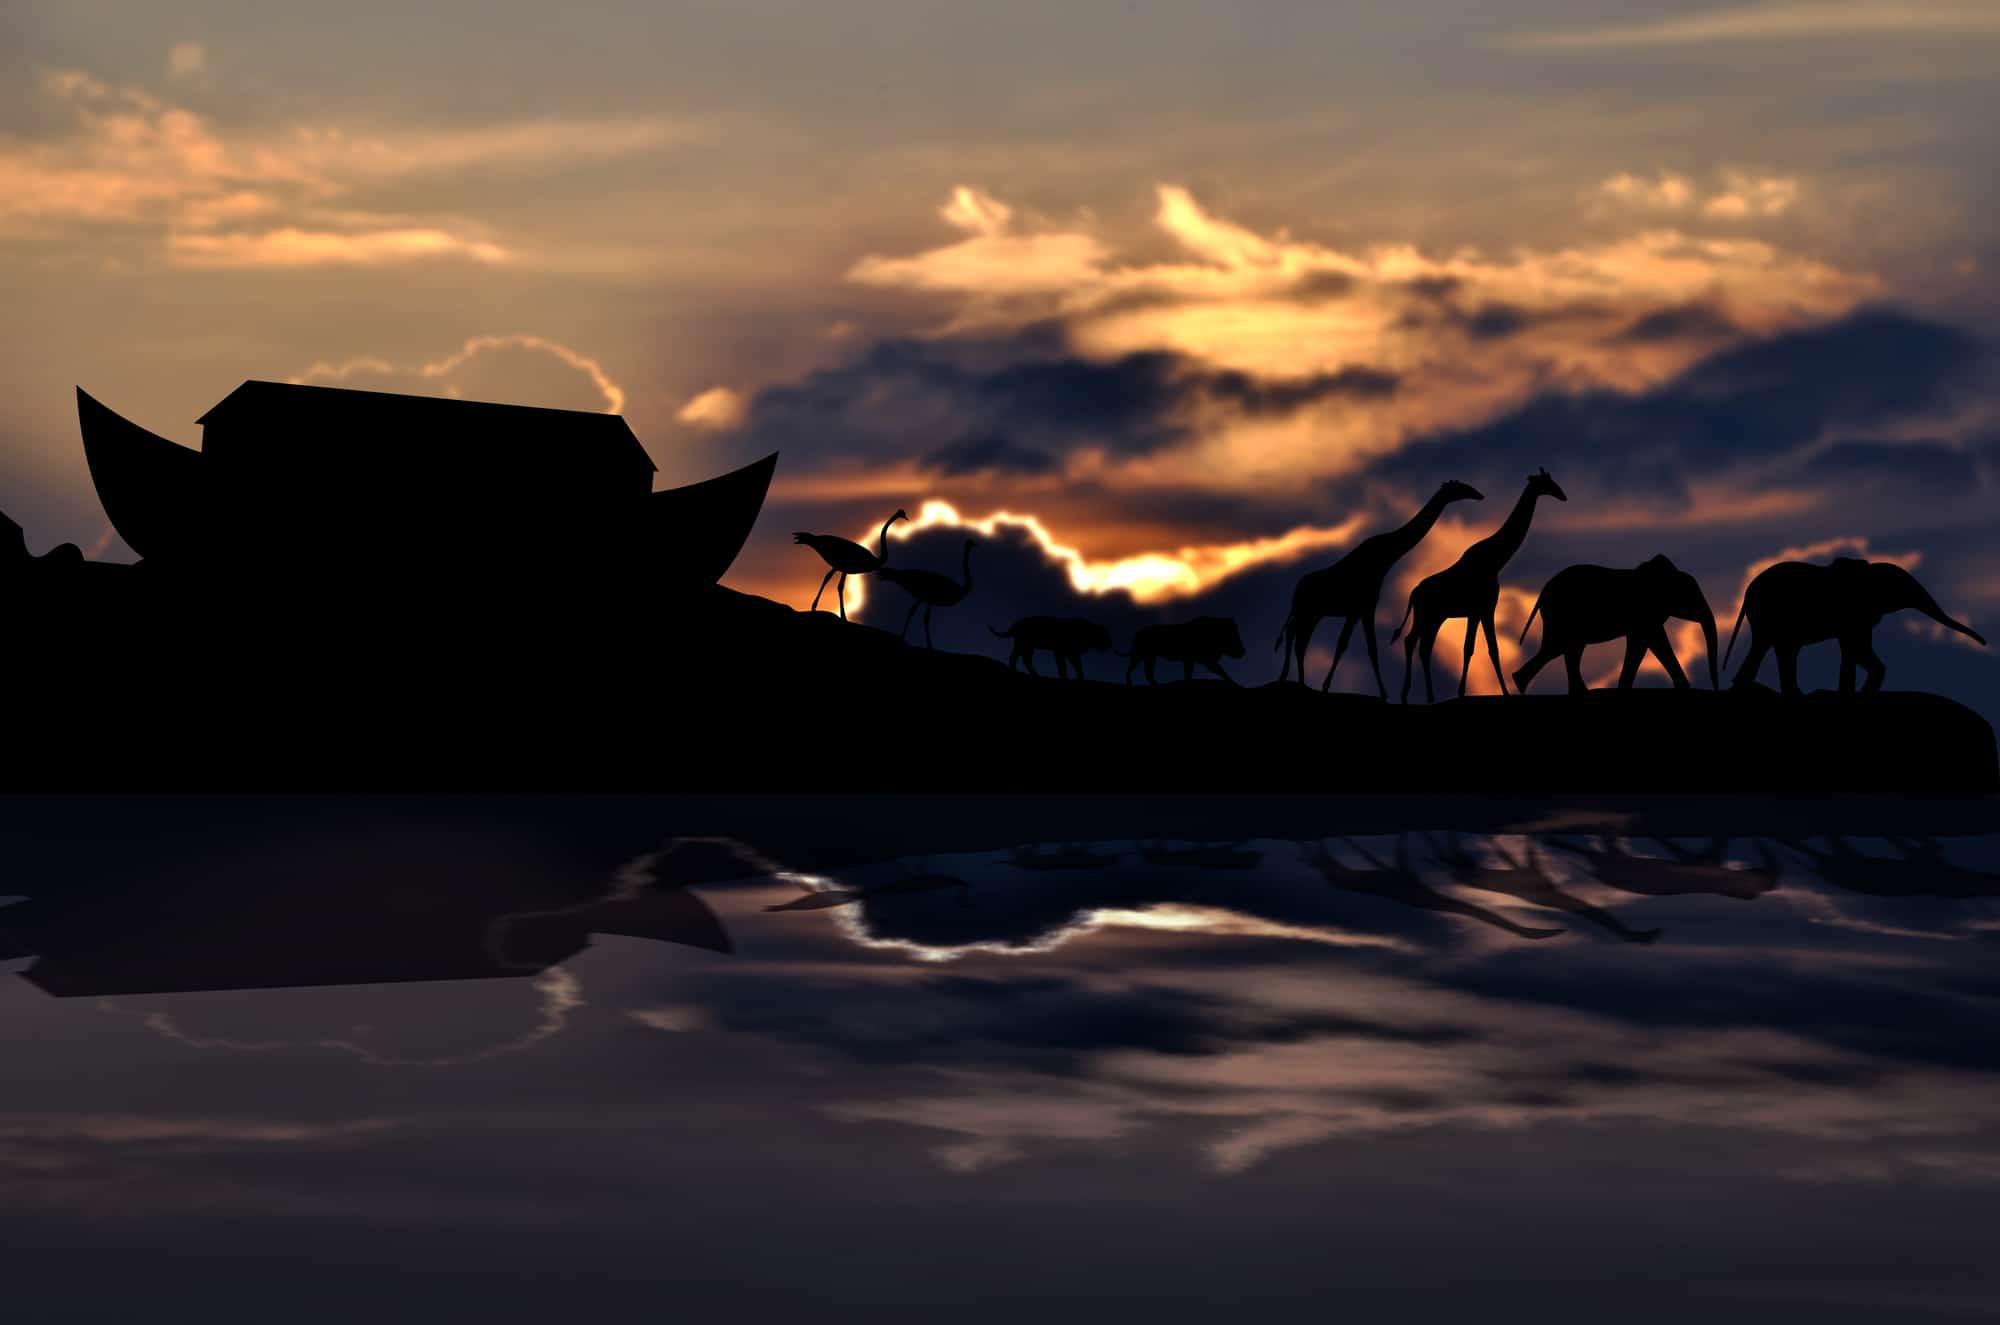 GRACE – THE DAYS OF NOAH